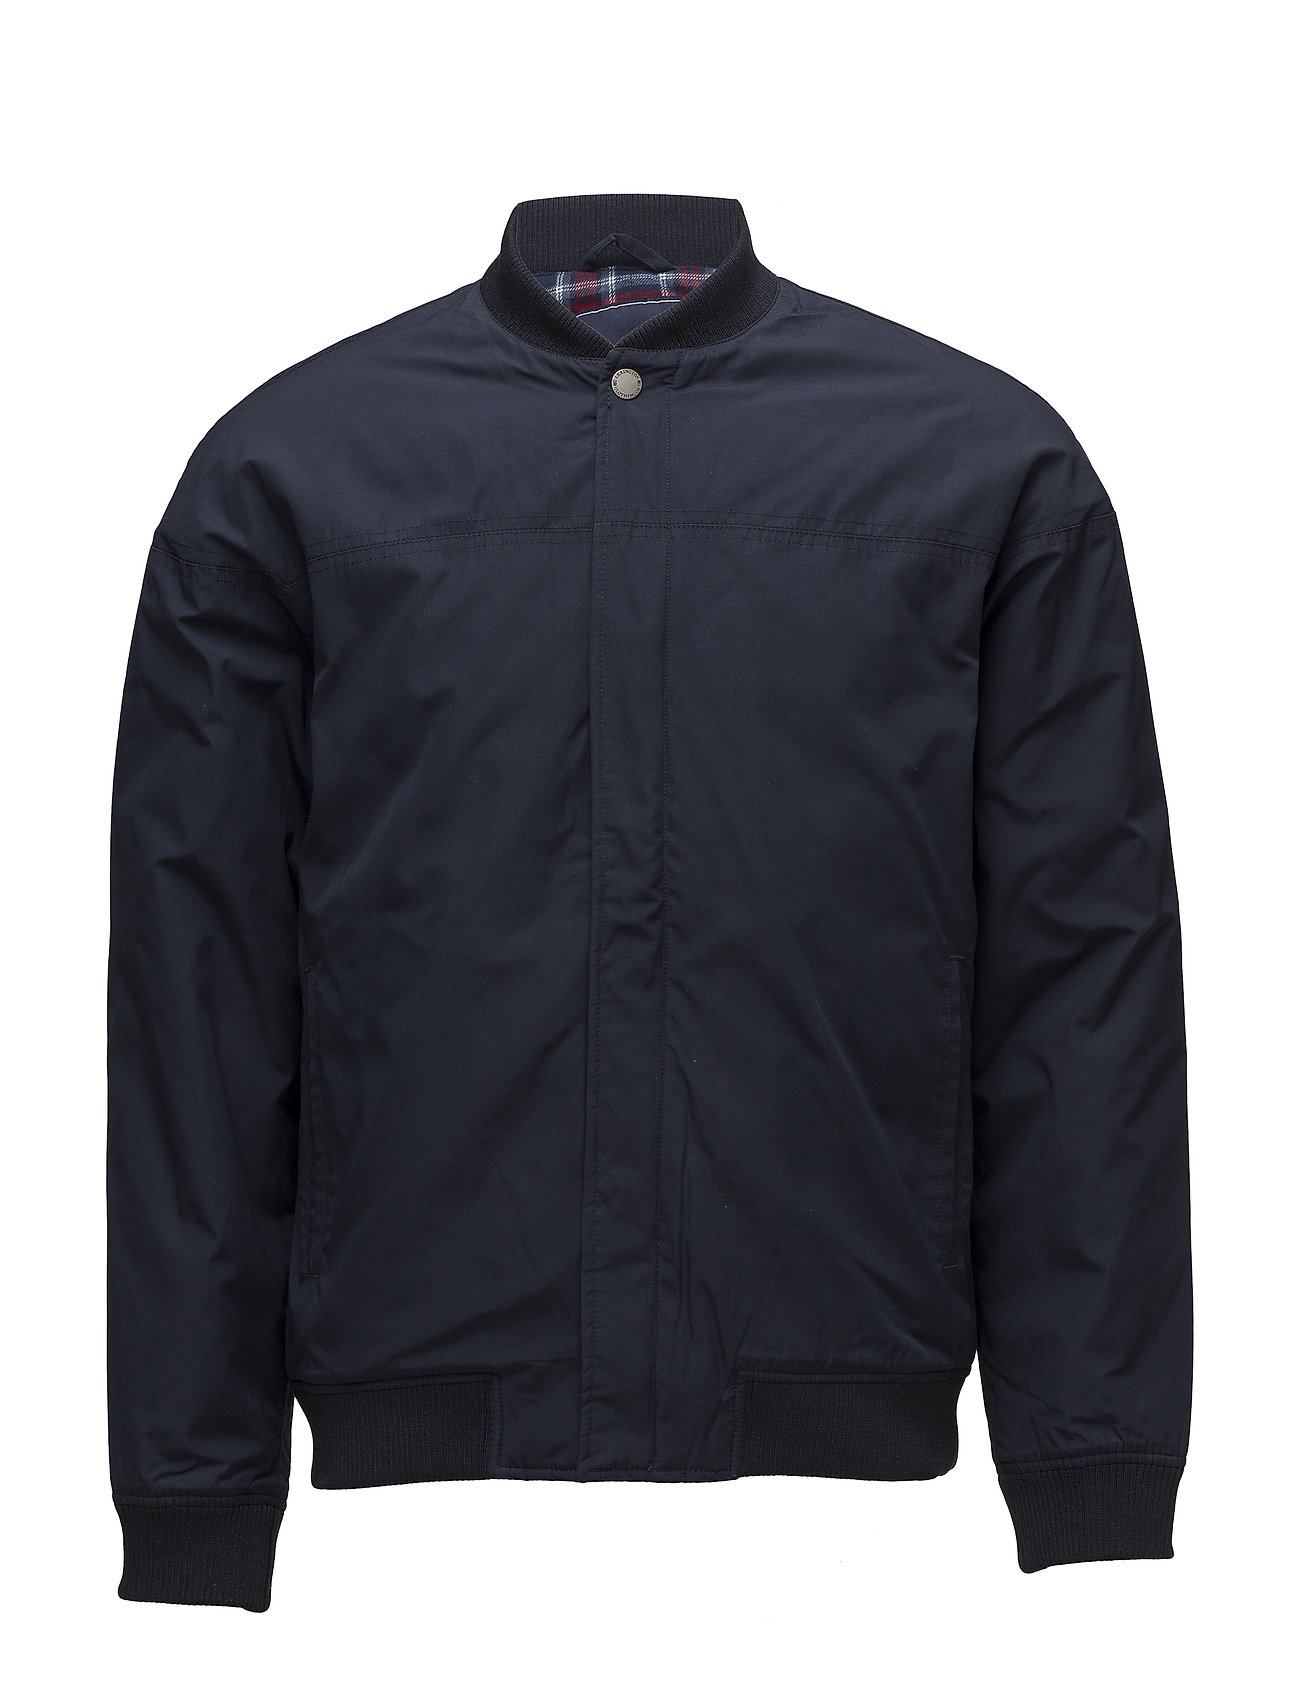 Lexington Clothing Richard Jacket - DEEP MARINE BLUE